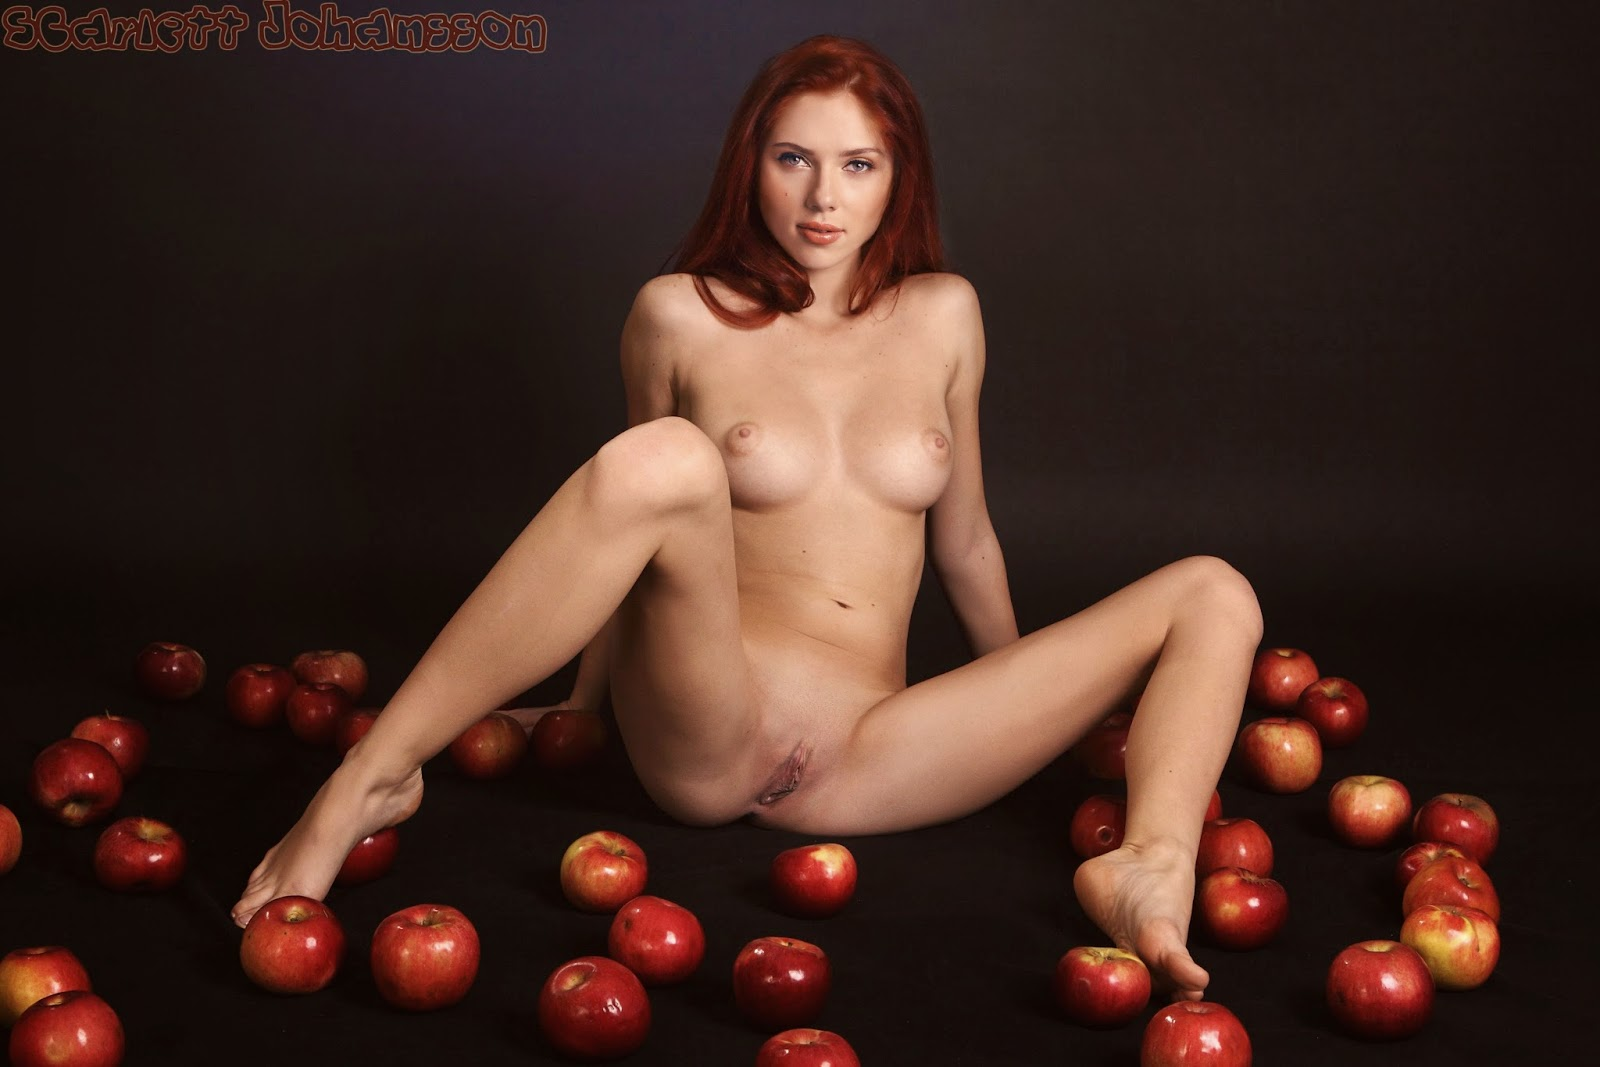 Free nude pics scarlet johanson